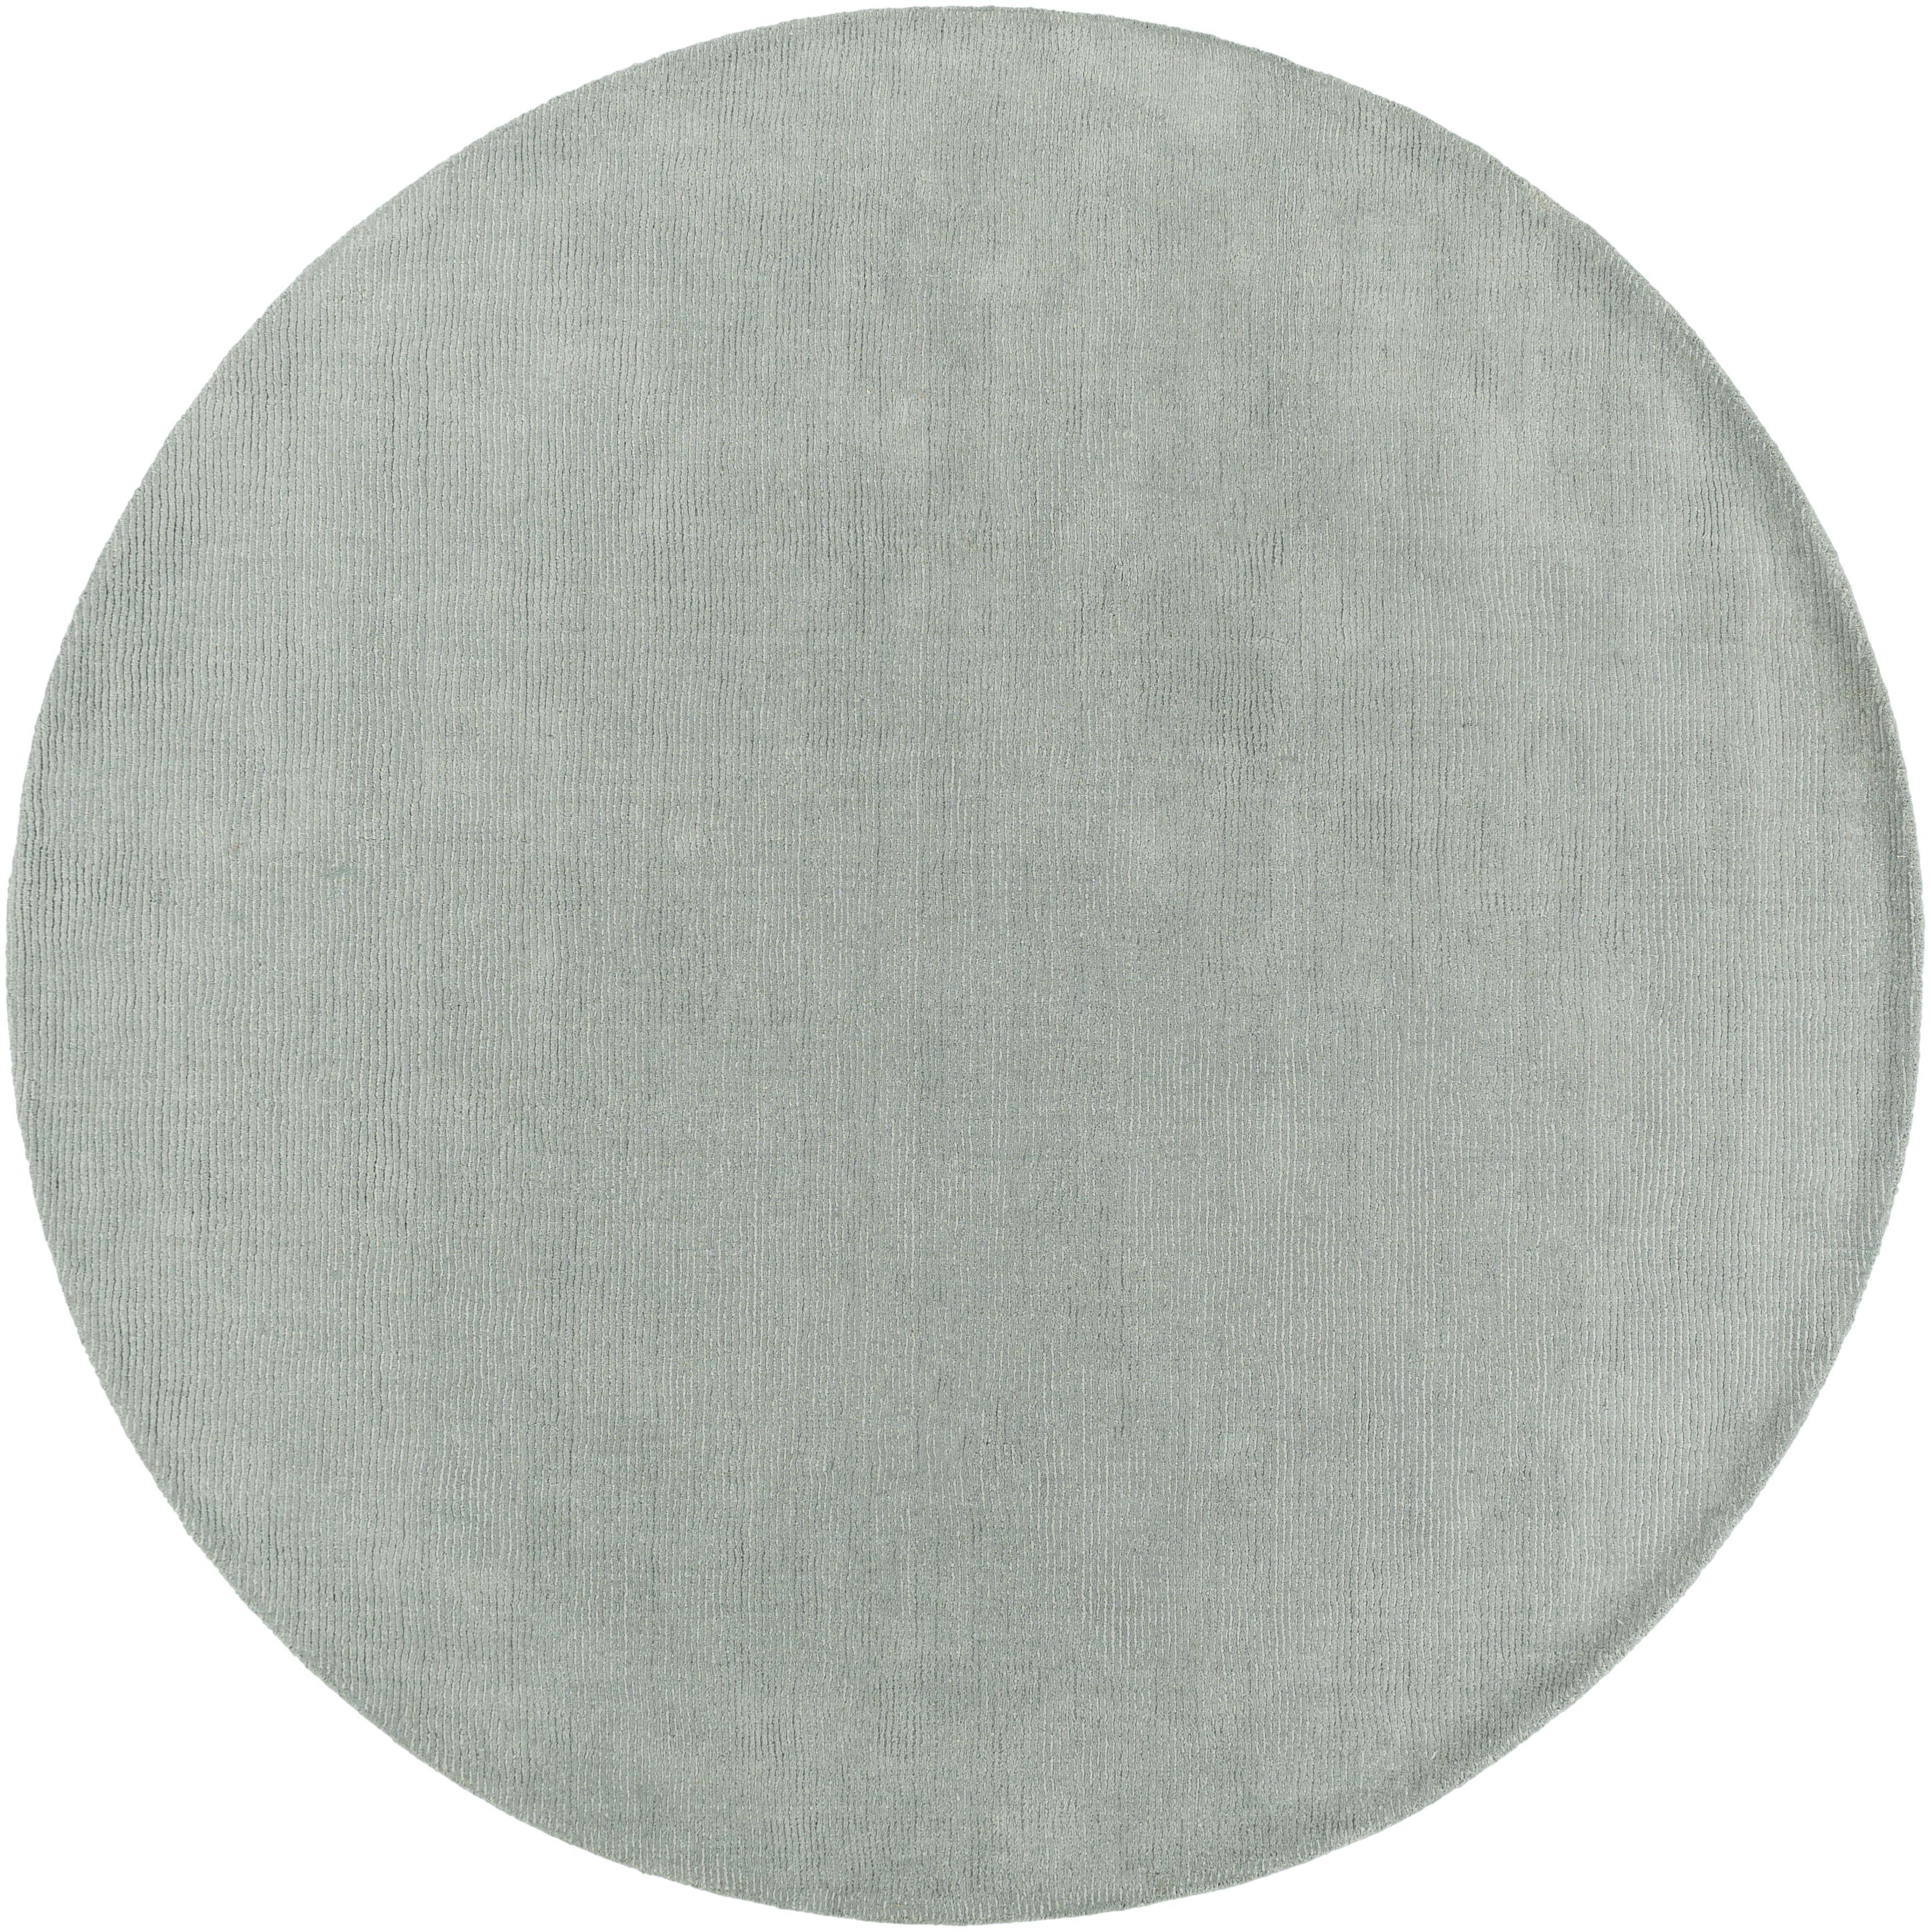 Surya Rugs Mystique 8' Round - Item Number: M5328-8RD